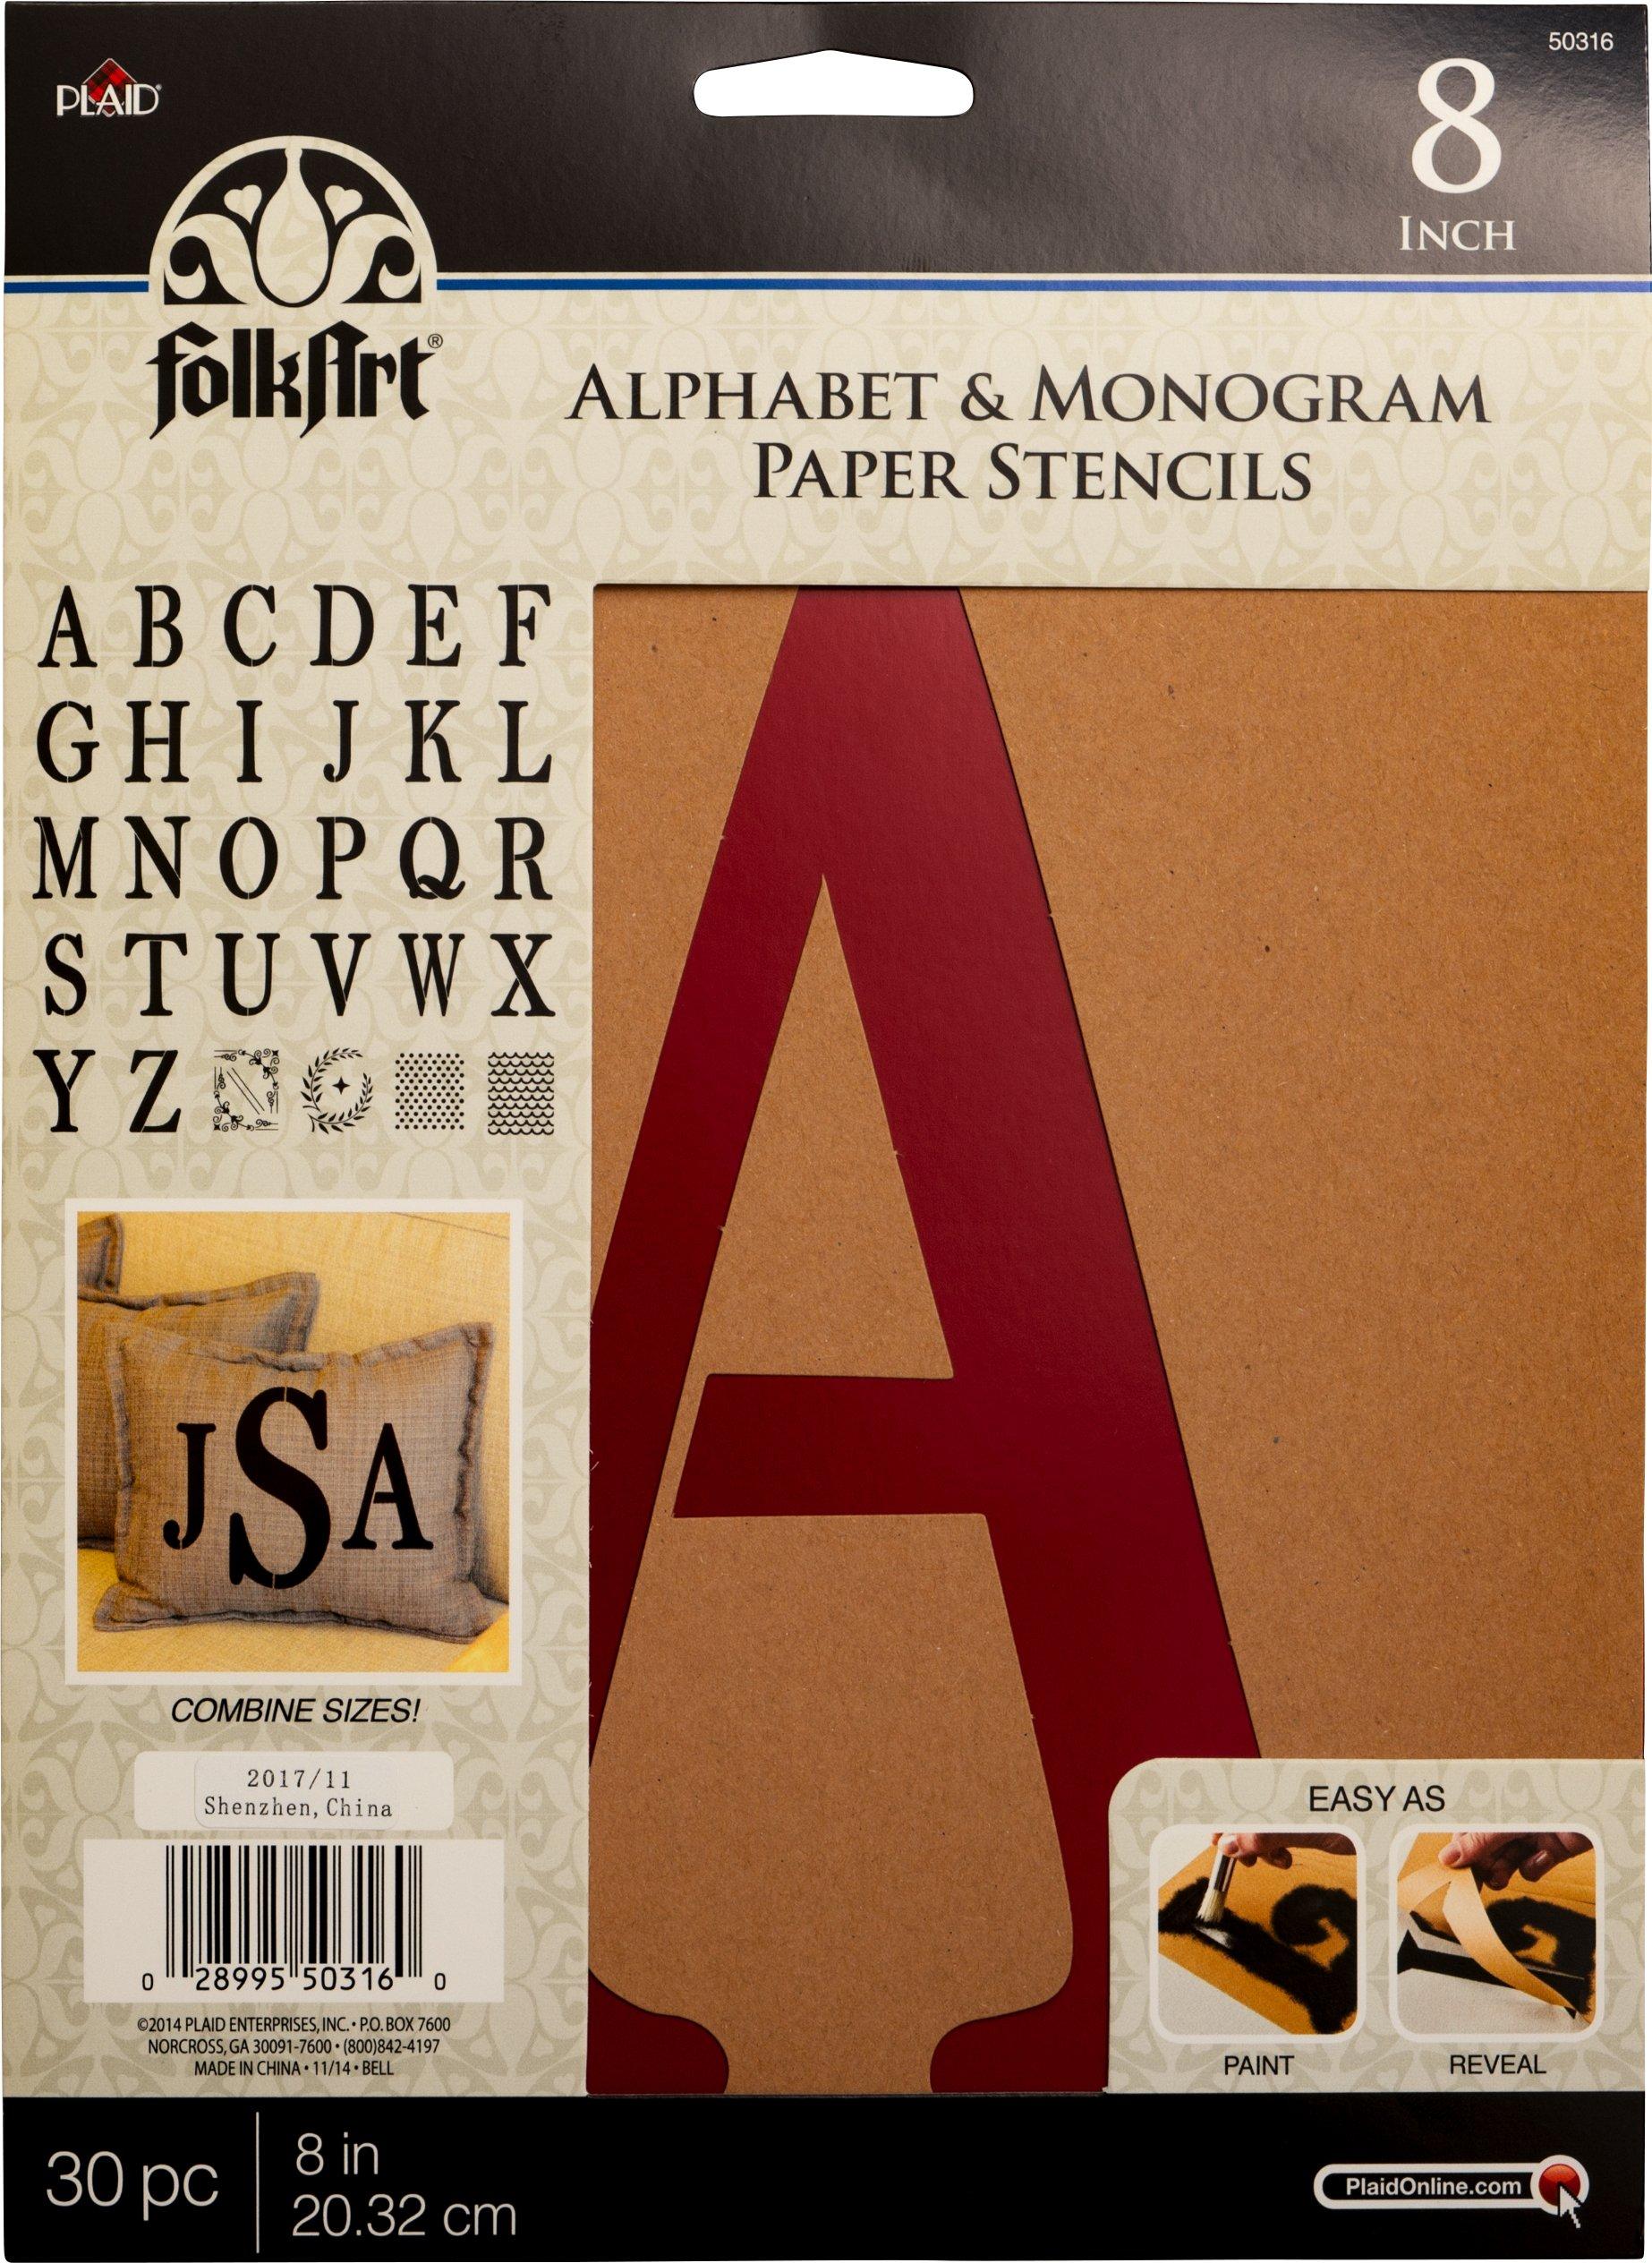 Plaid PLA50316 Stencil Folk-Art Paper Alphabet & Monogram Serif, 8''